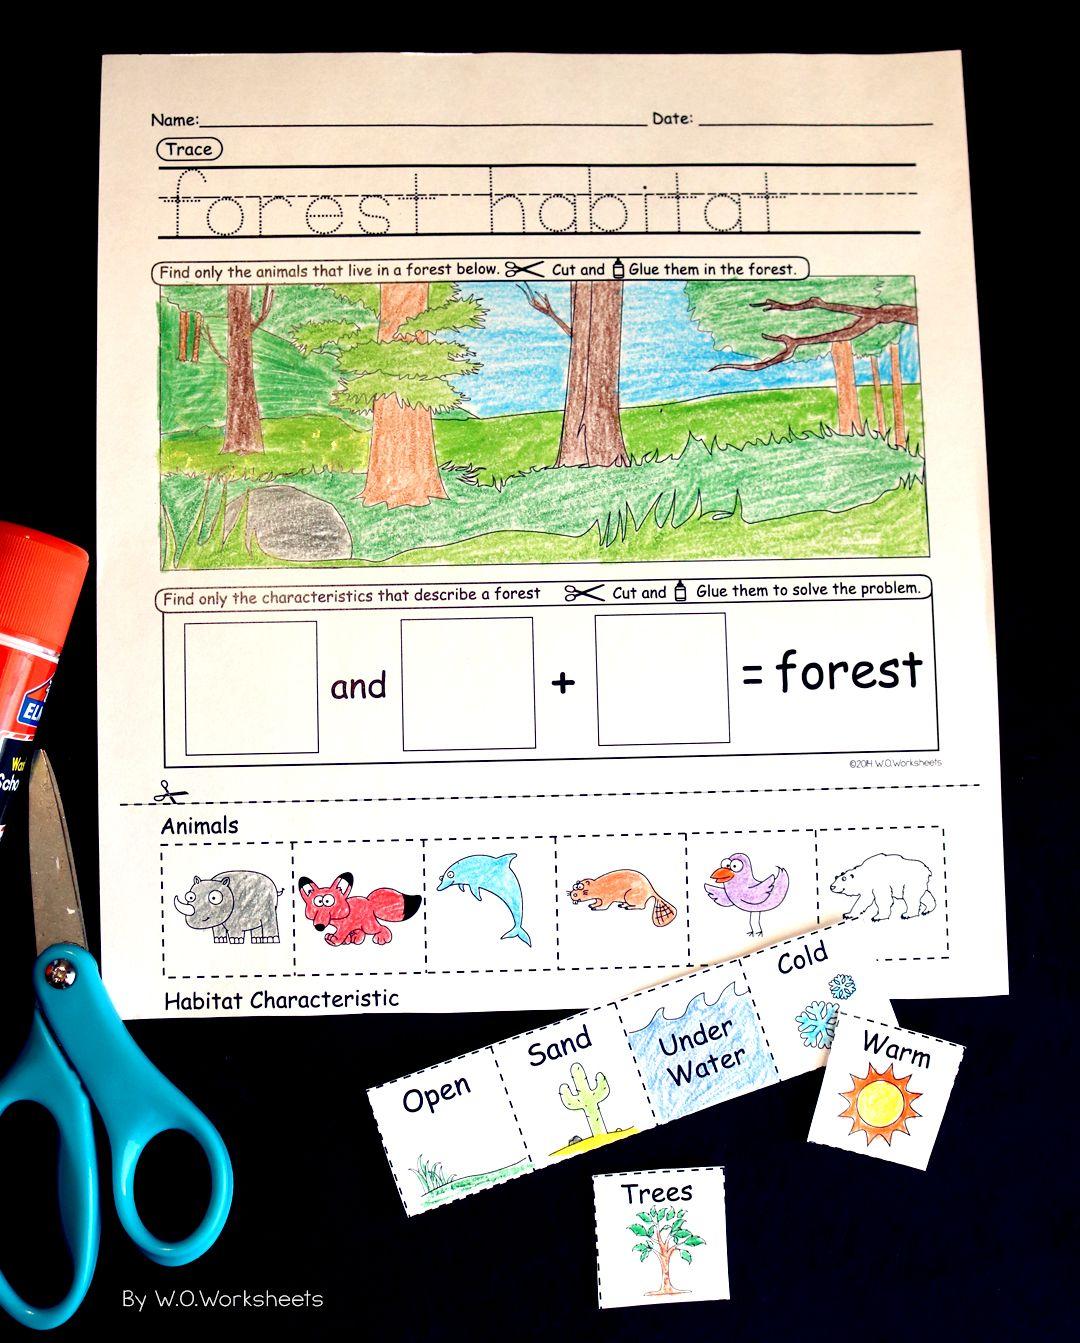 Animal Habitat Worksheets That Provide Visuals To